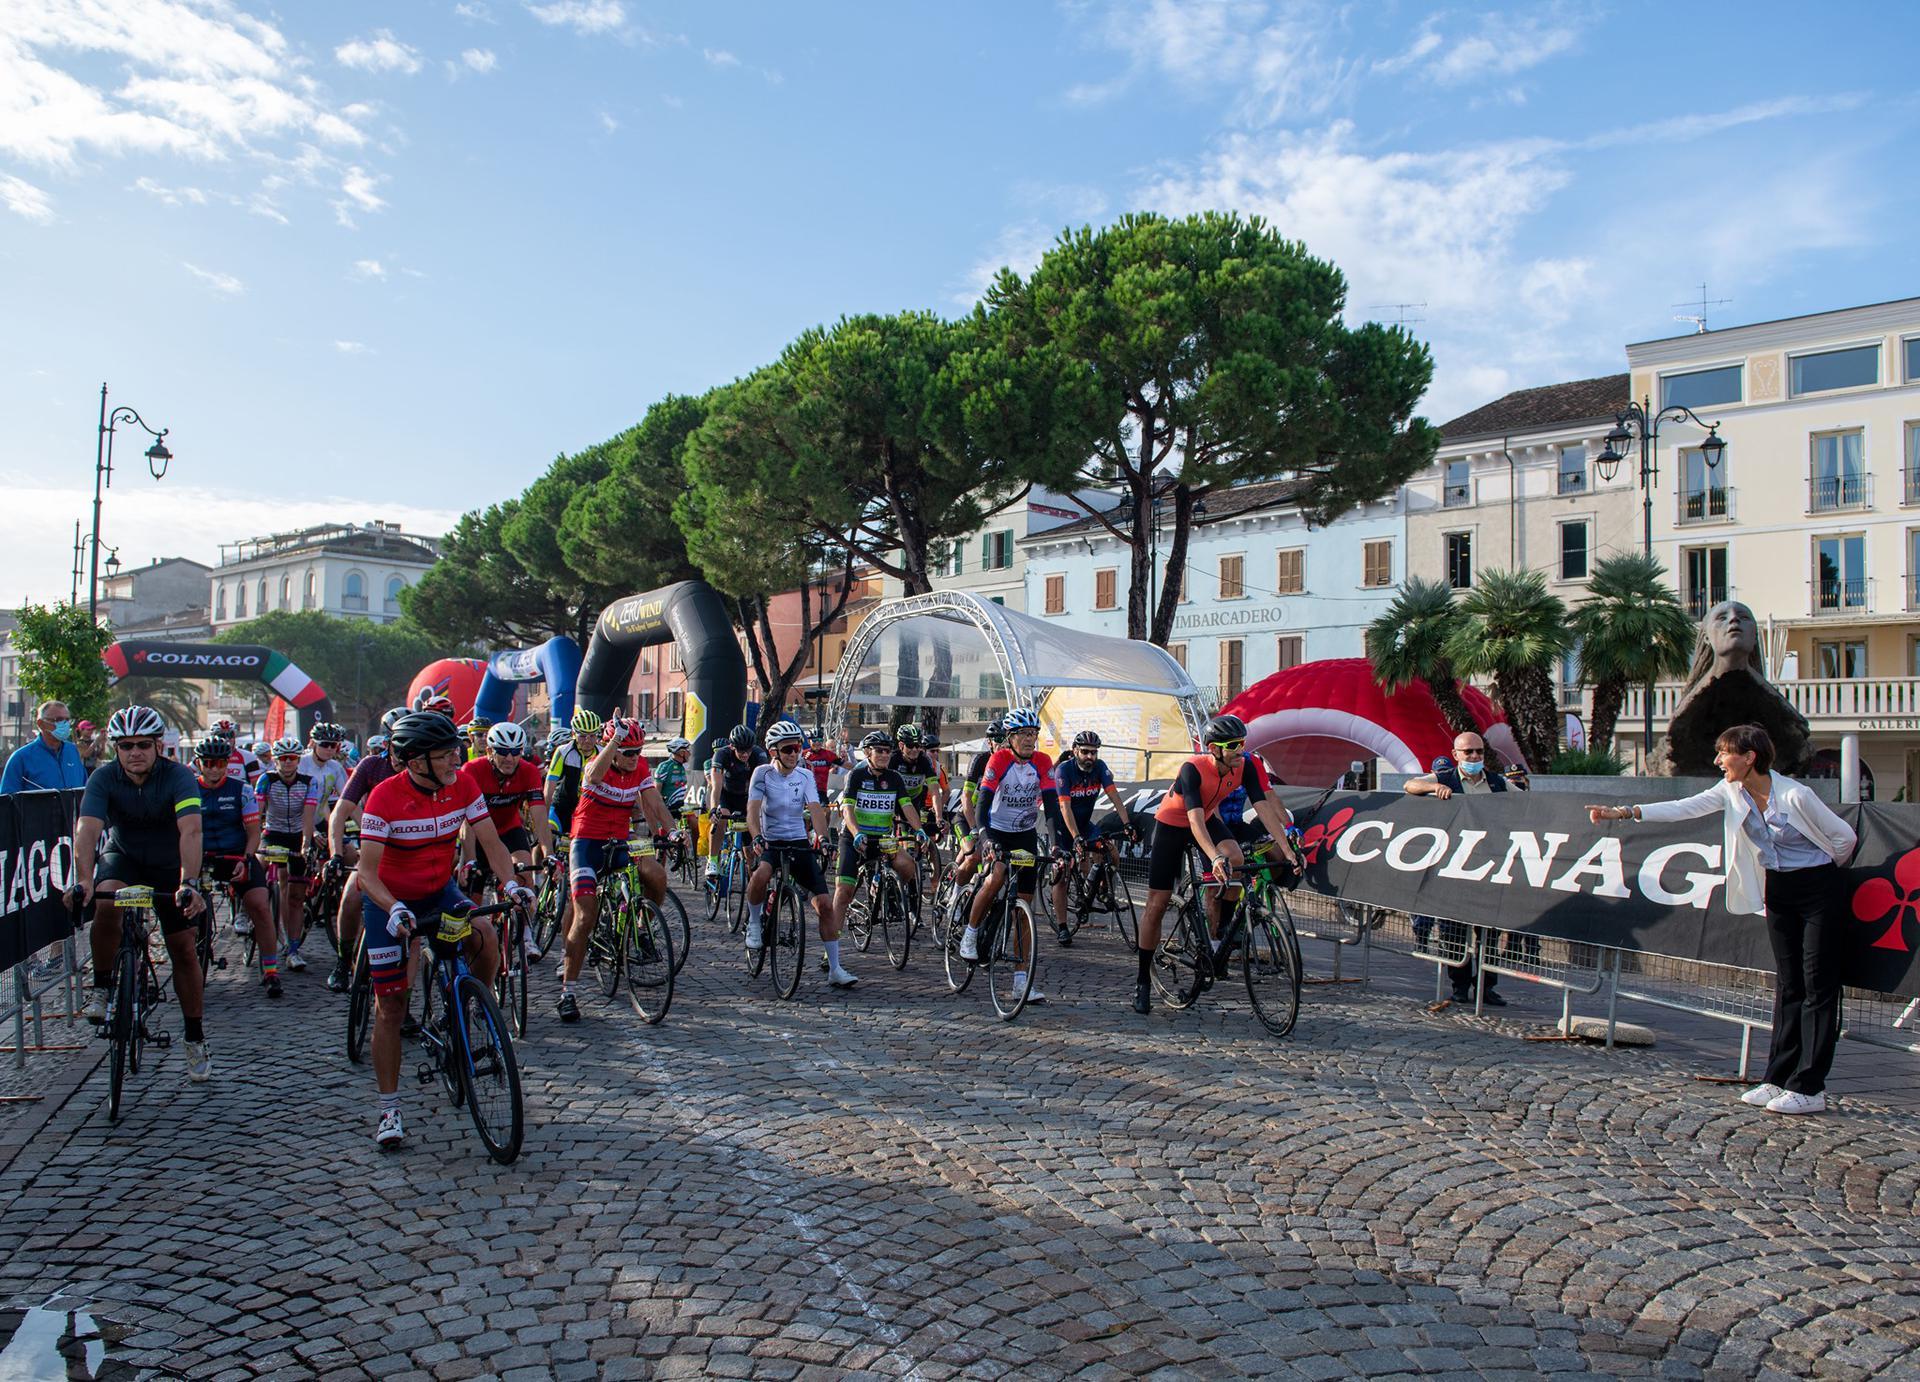 Das Colnago Cycling Festival 2021 wird eröffnet